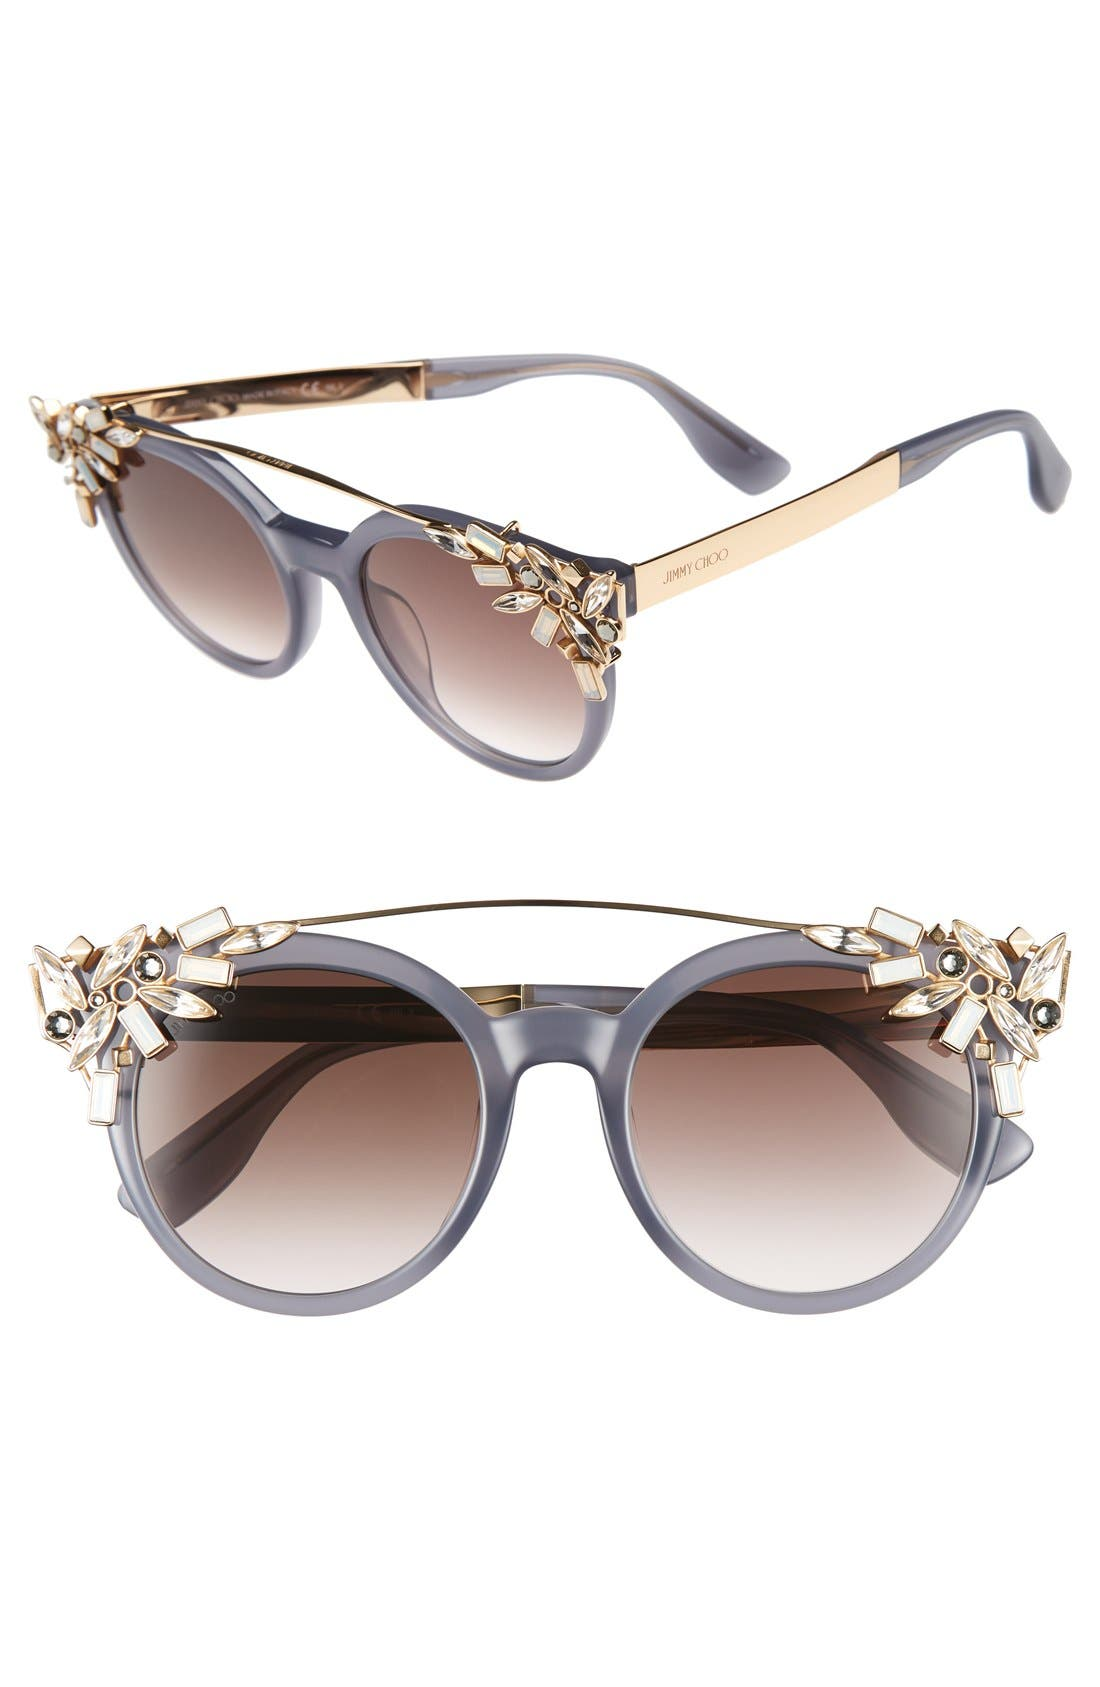 Main Image - Jimmy Choo 'Vivy' 51mm Sunglasses